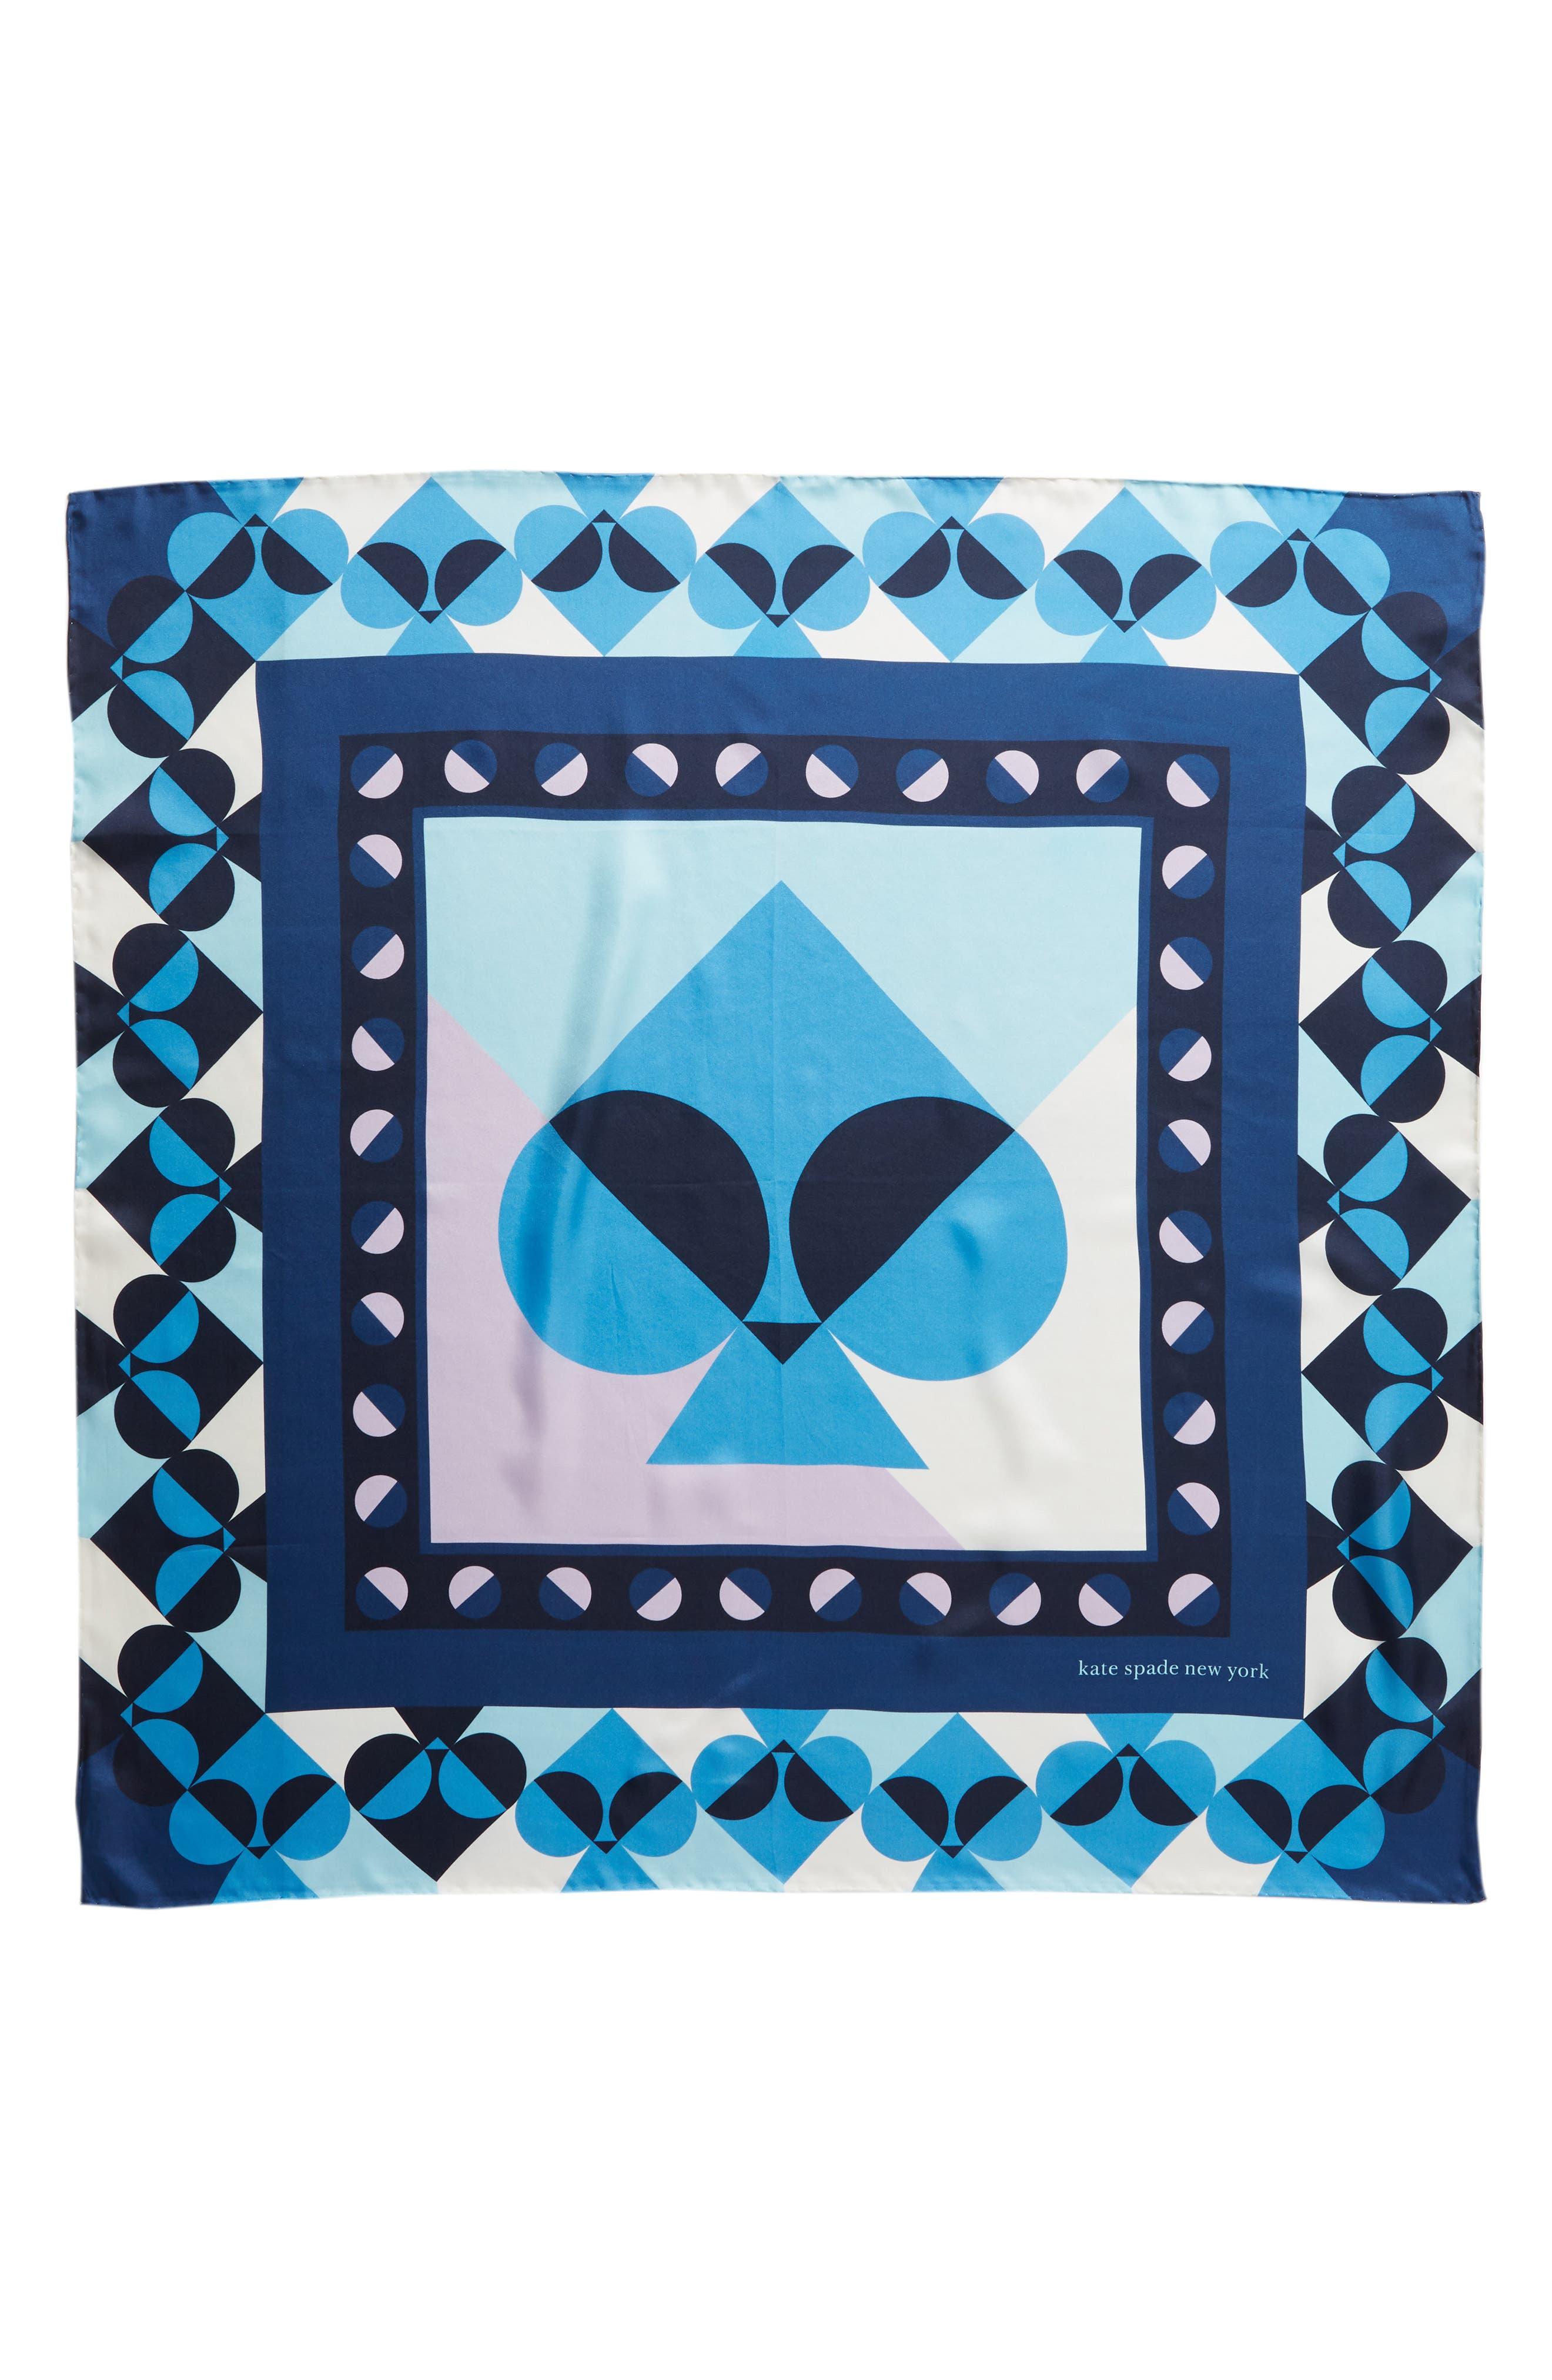 KATE SPADE NEW YORK,                             geospade square silk scarf,                             Alternate thumbnail 3, color,                             AMULET BLUE